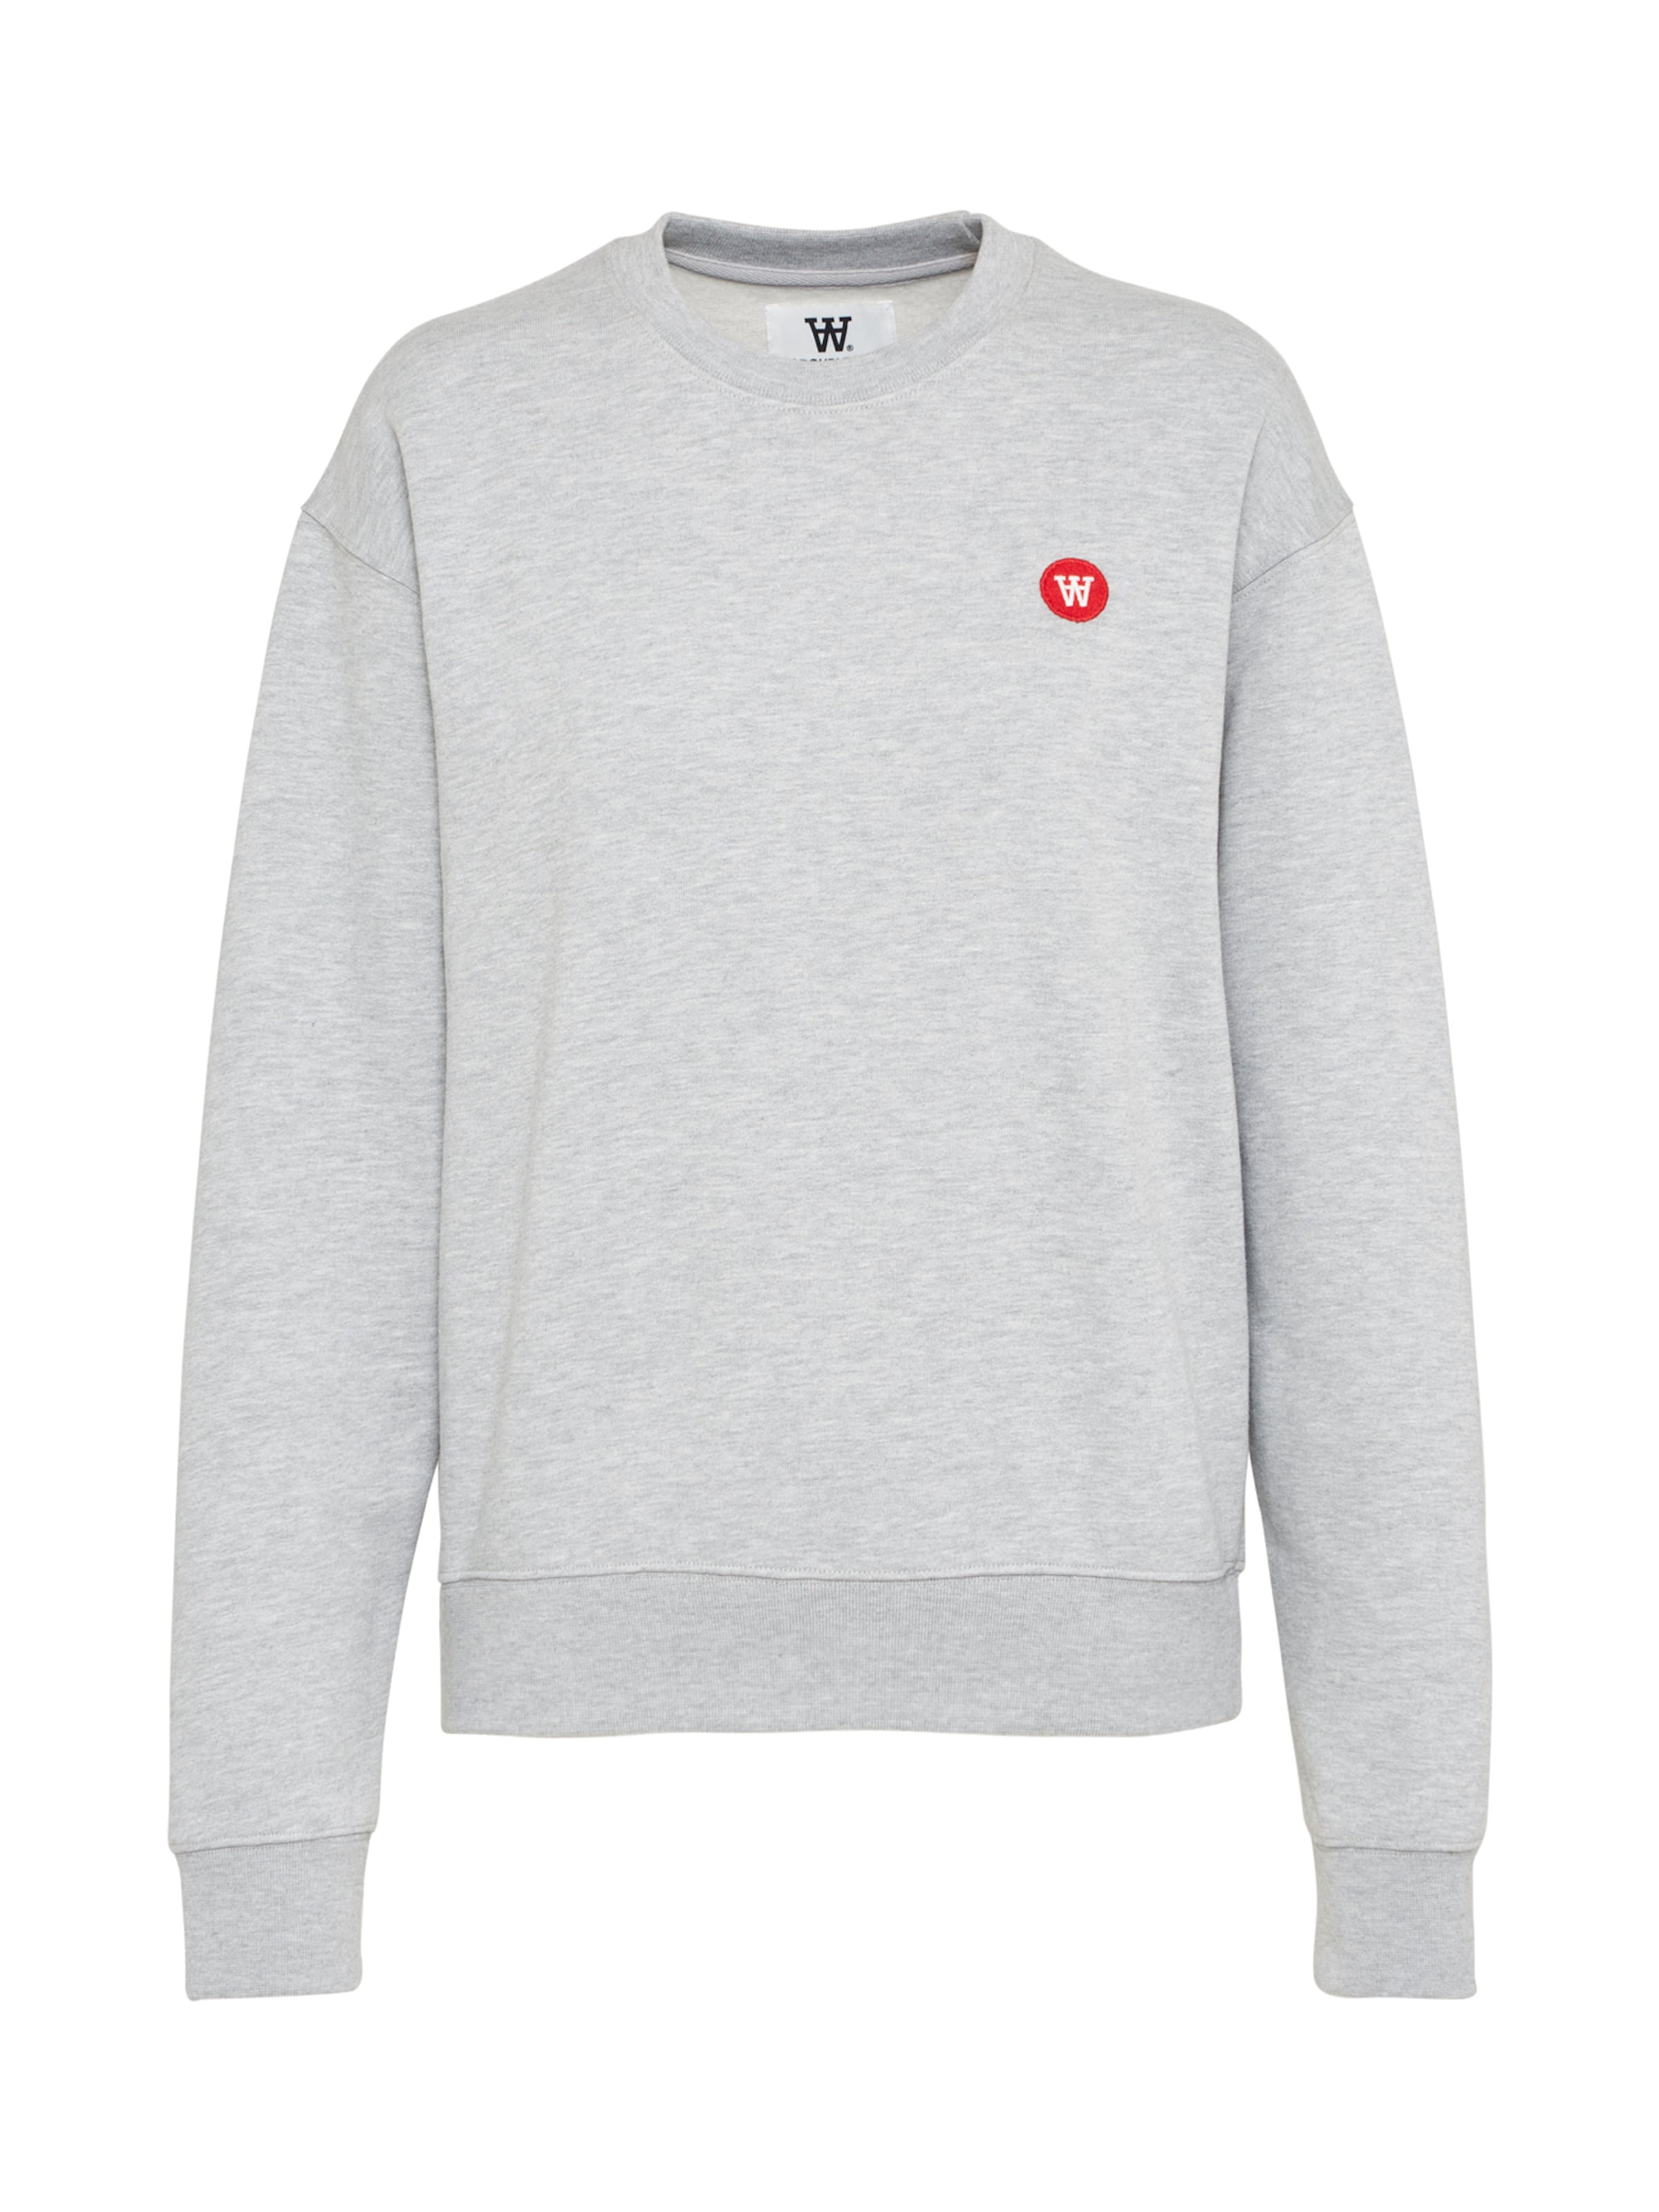 'jess' Wood Sweatshirt Sweatshirt Wood In Grau 'jess' c4ARj35Lq